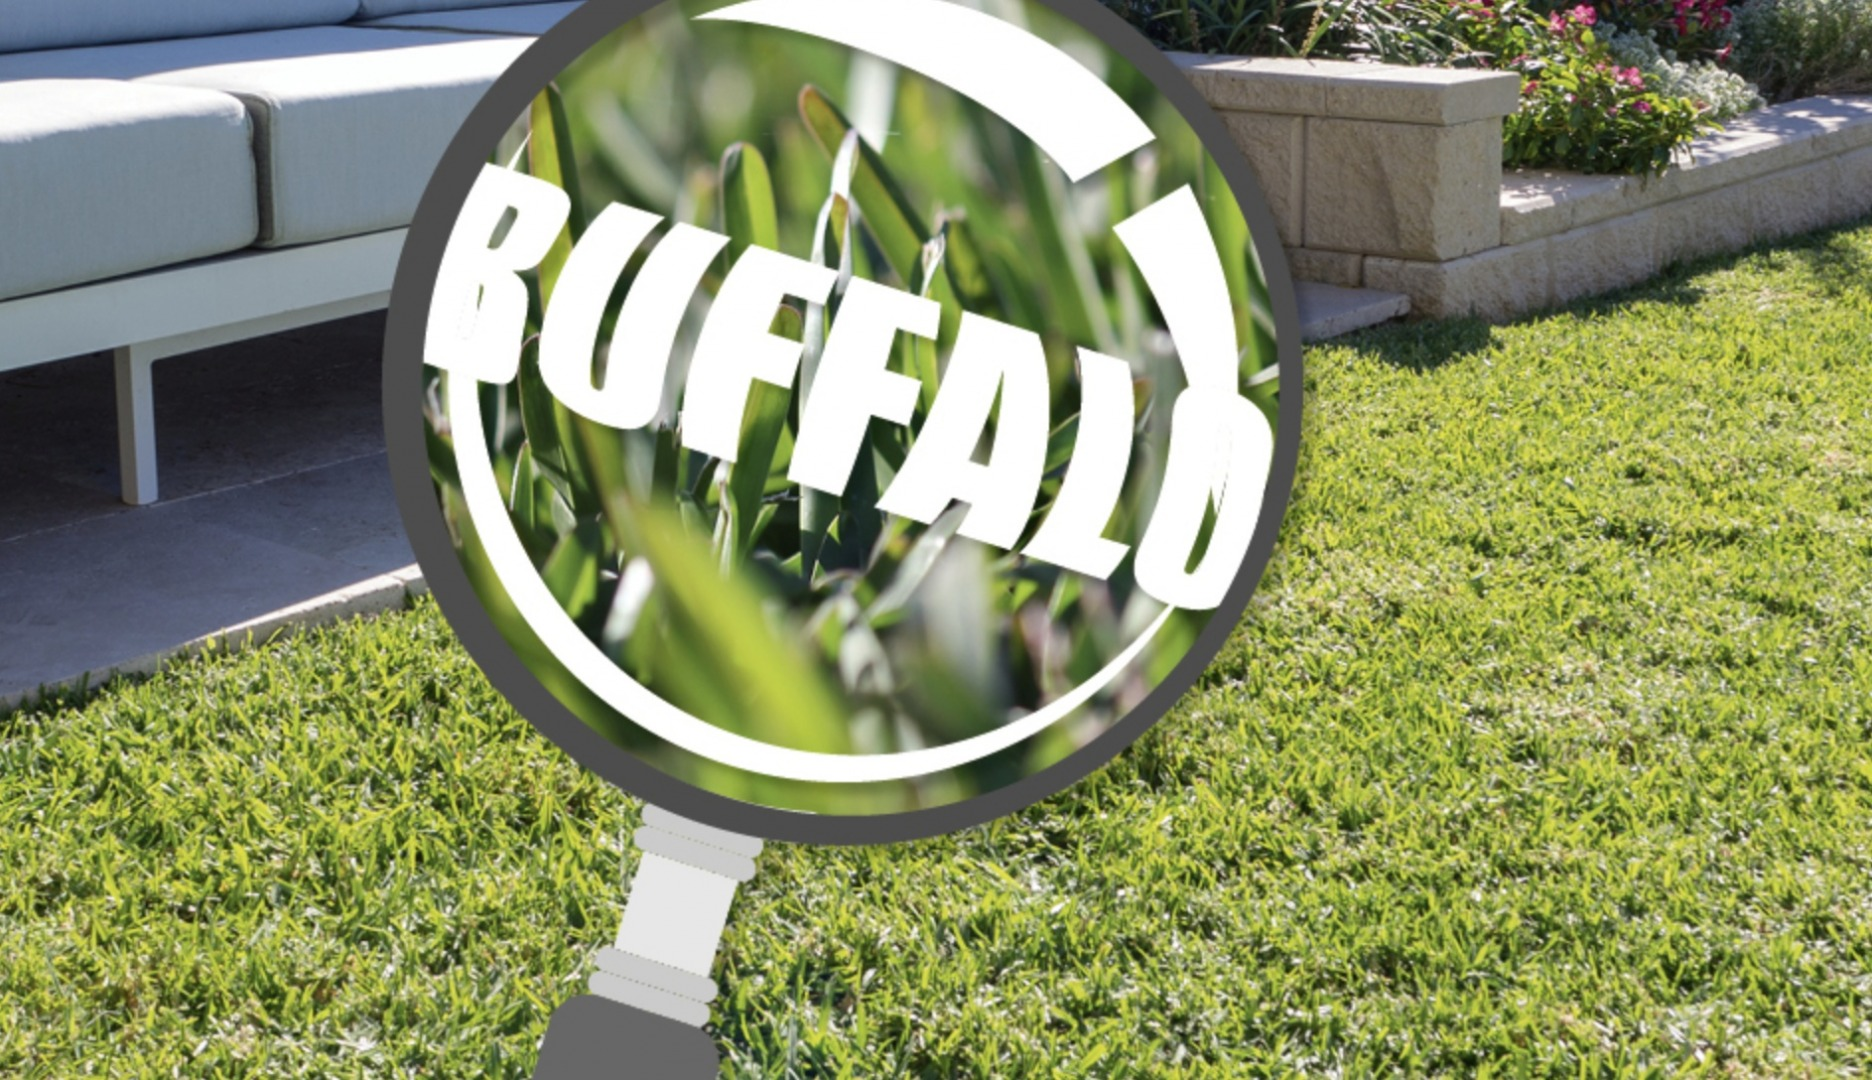 Buffalo Grass in Focus